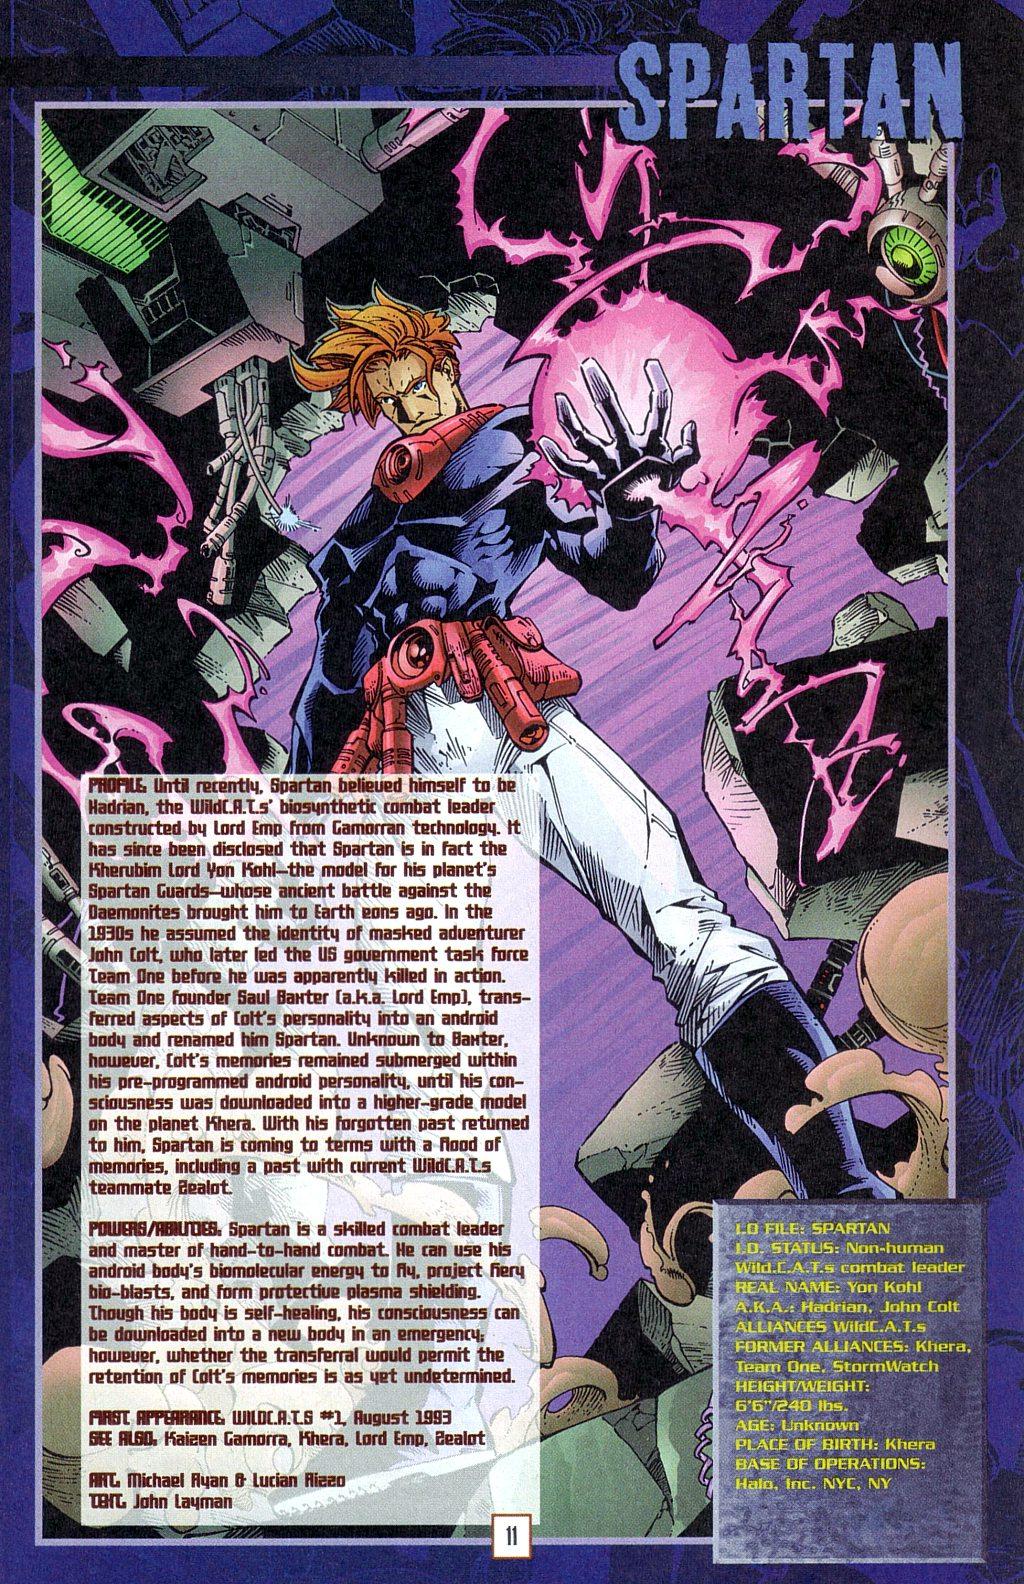 In 'Wildstorm Universe' (1996) #1, we find the source file for the Kherubim superhero named Spartan.